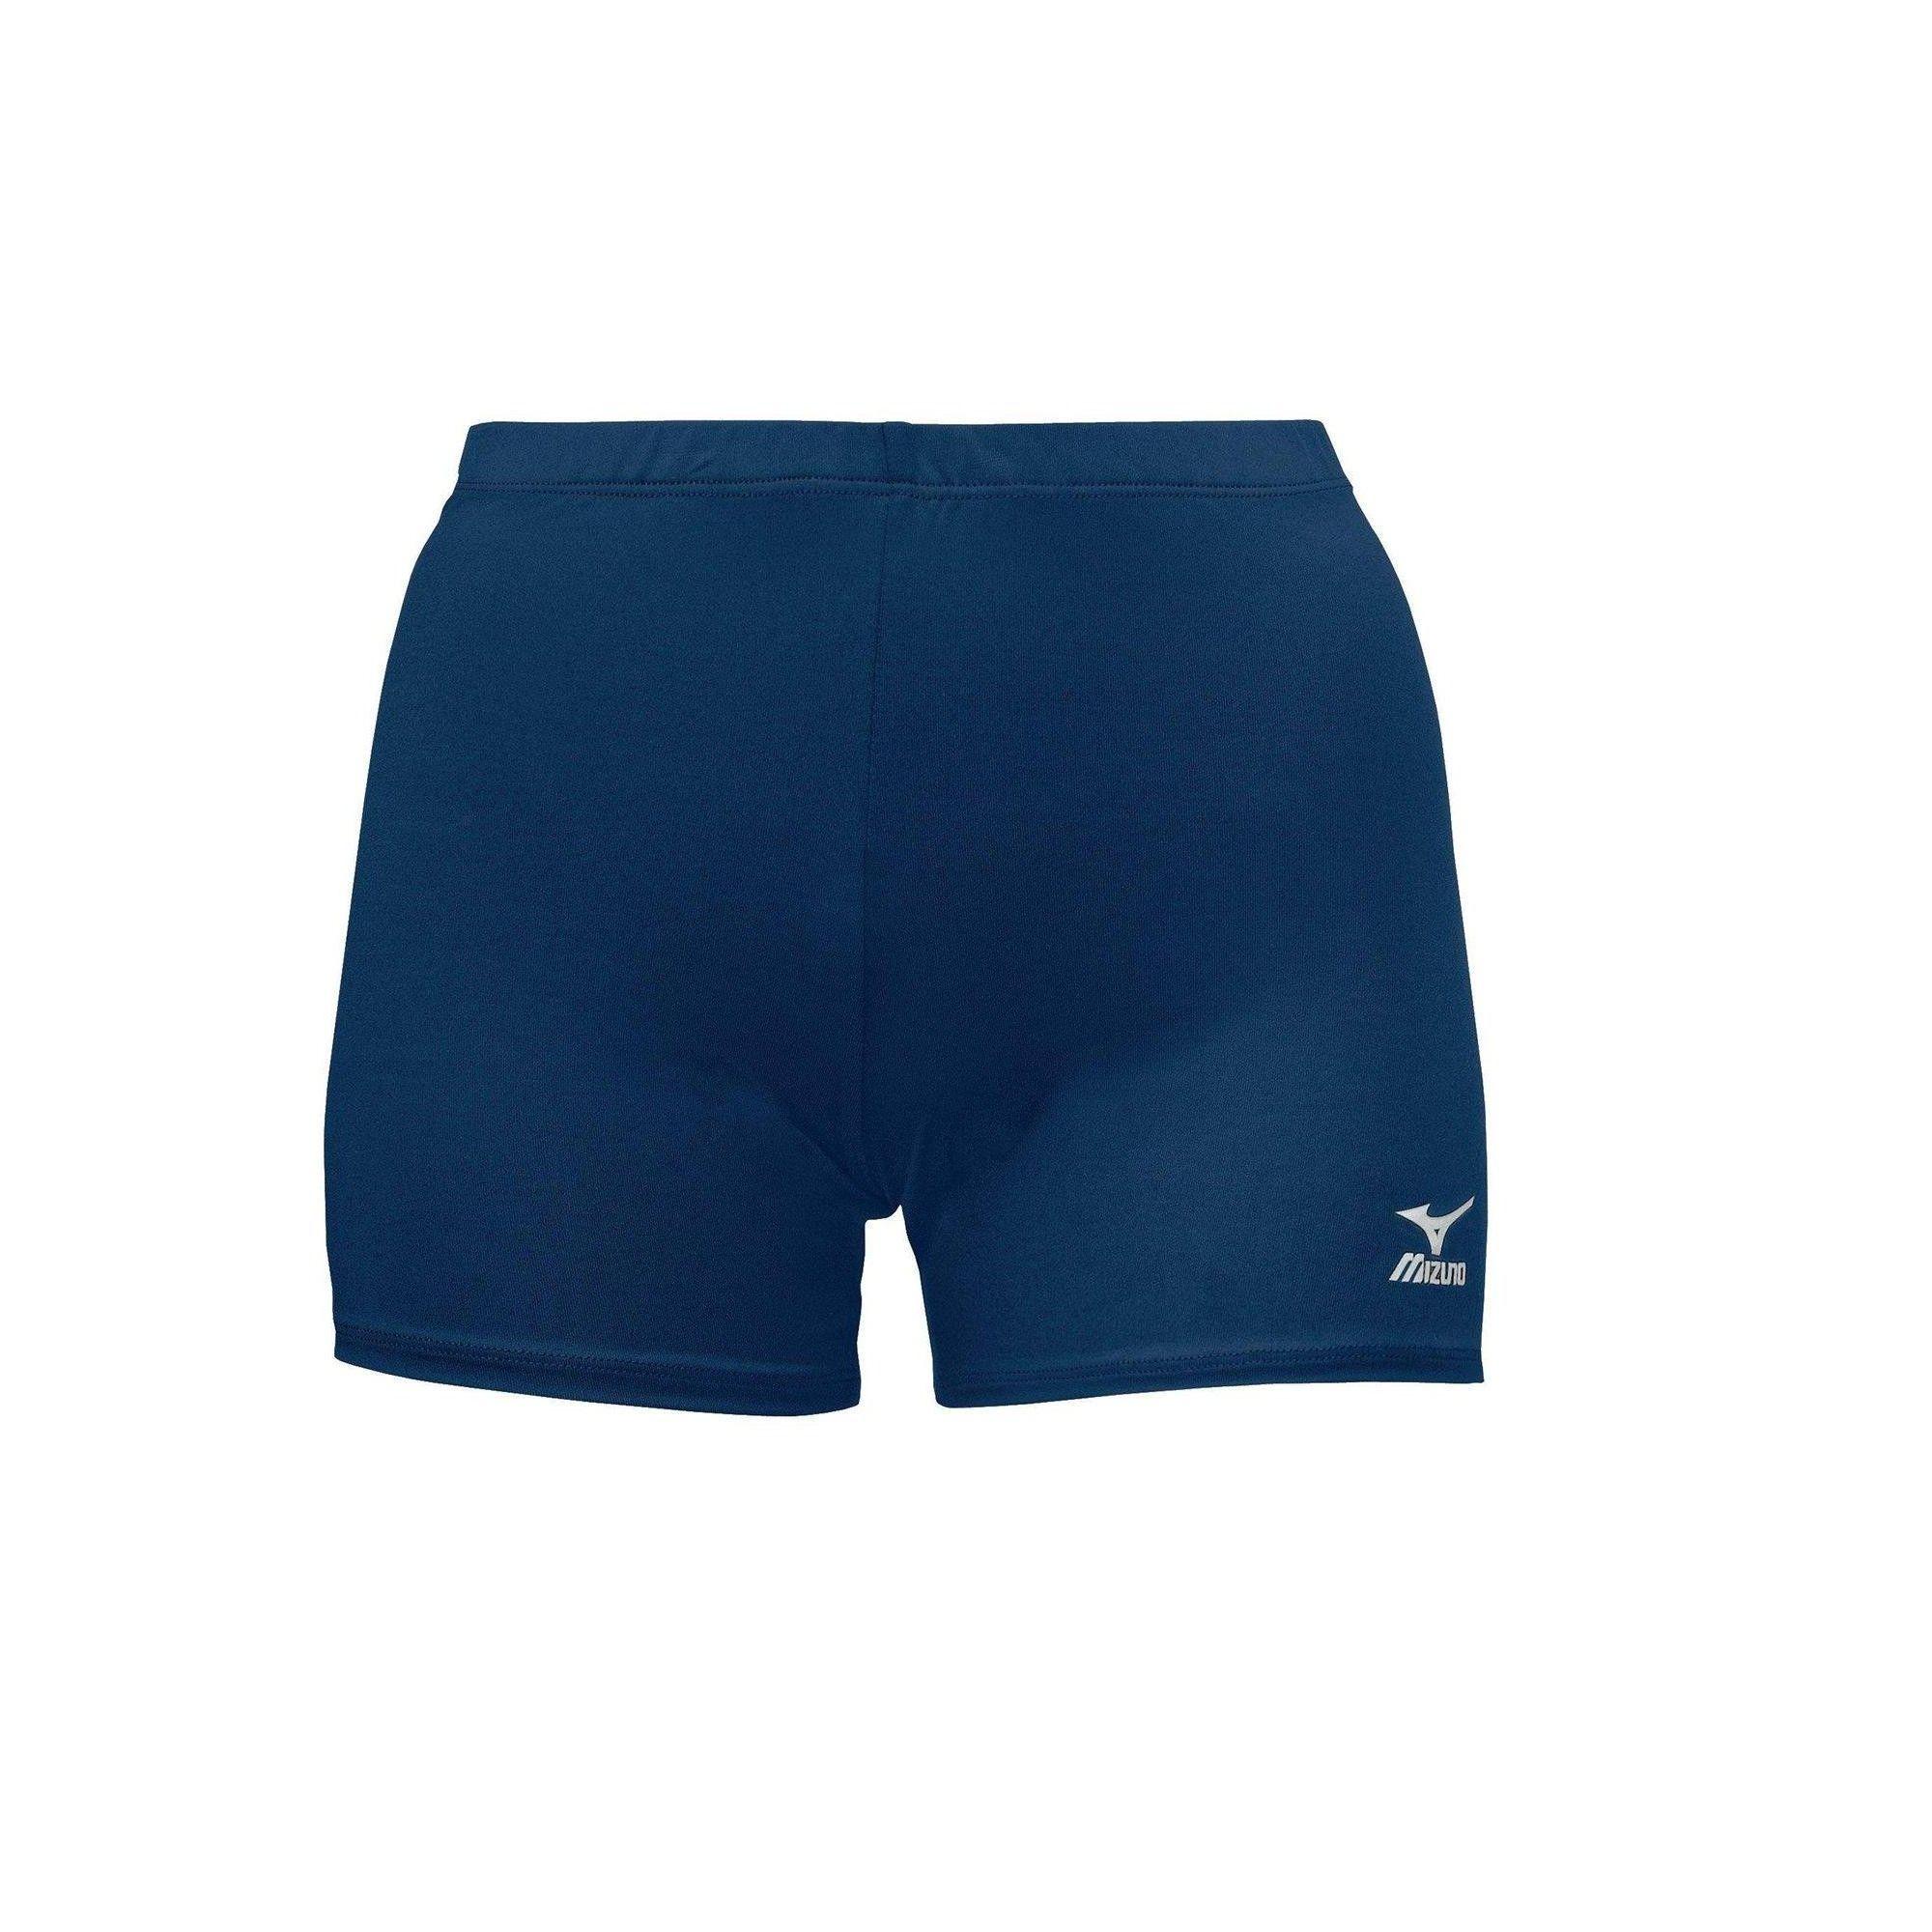 Mizuno Womens Volleyball Apparel Vortex Short 440202 Size Small Navy Blue 5151 Volleyball Shorts Volleyball Outfits Size Girls